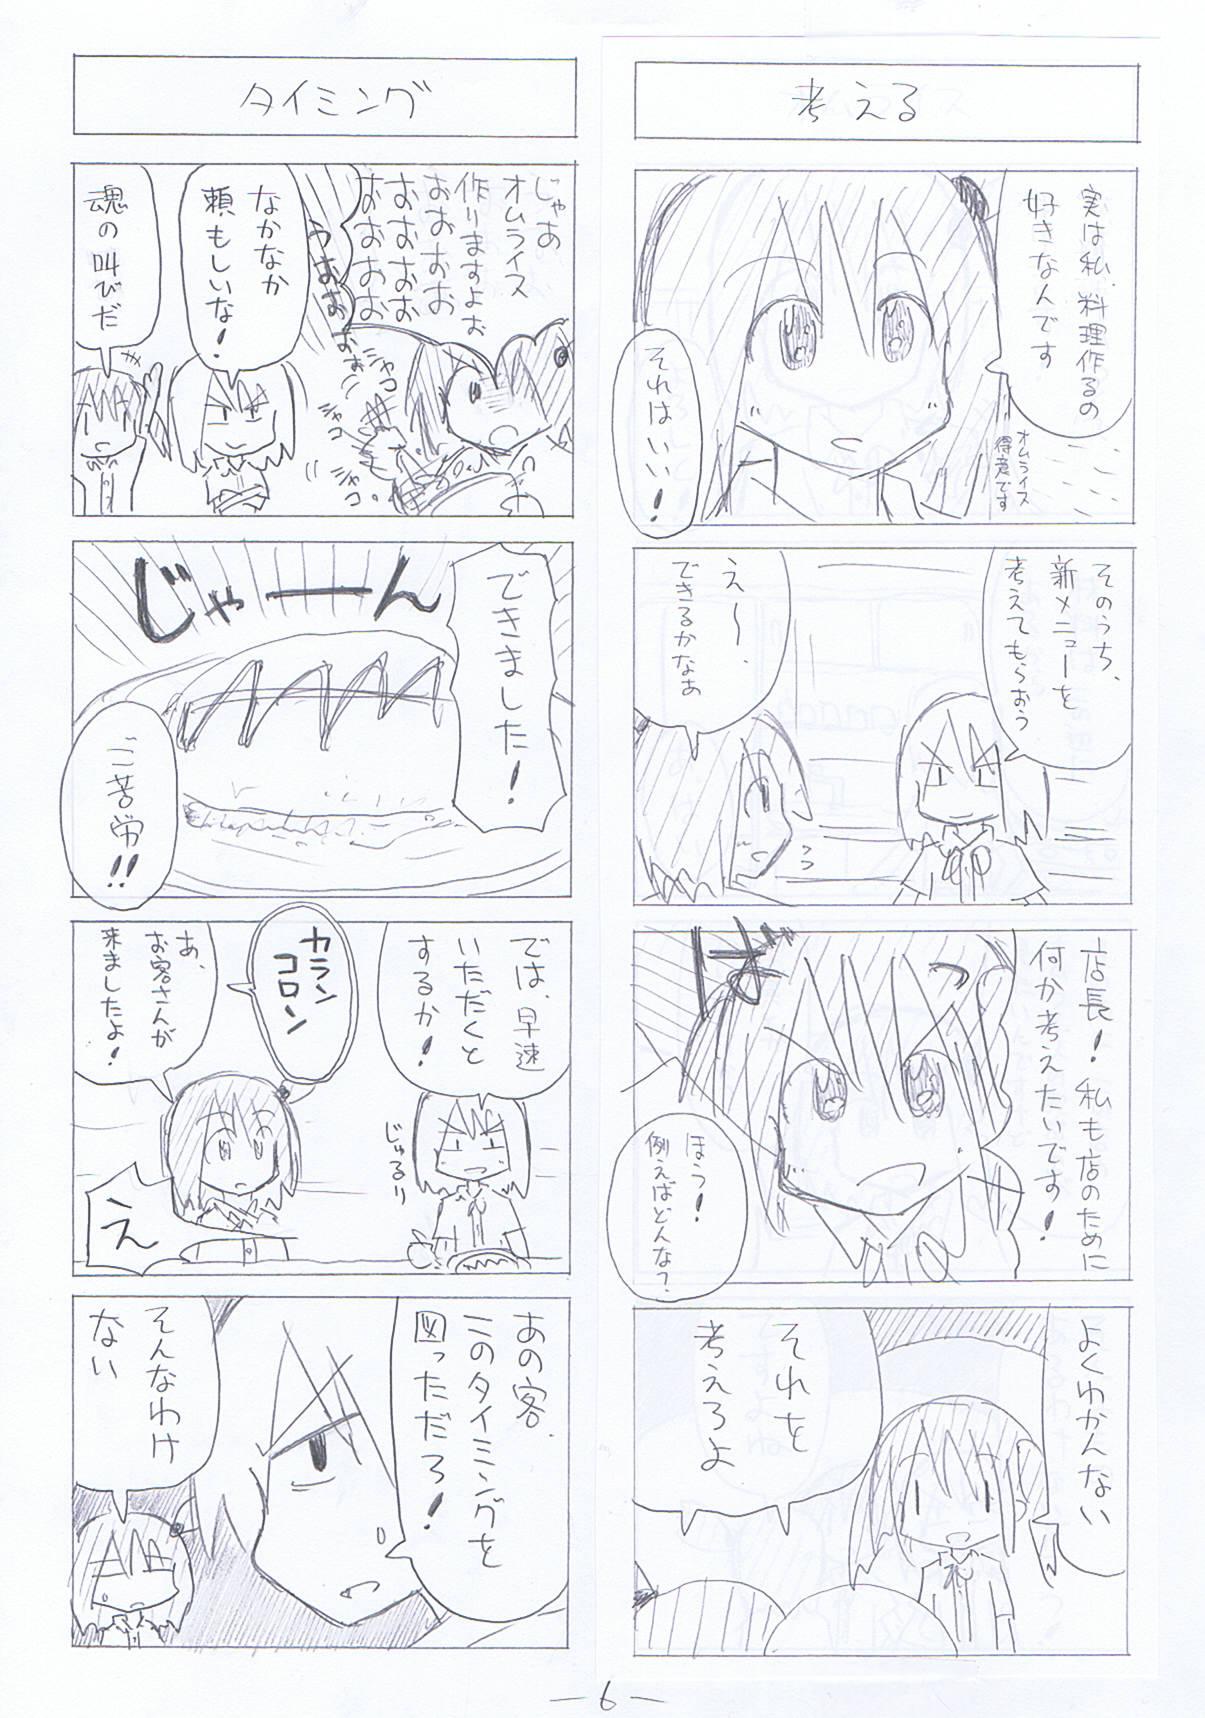 hitotoki-3-6.jpg